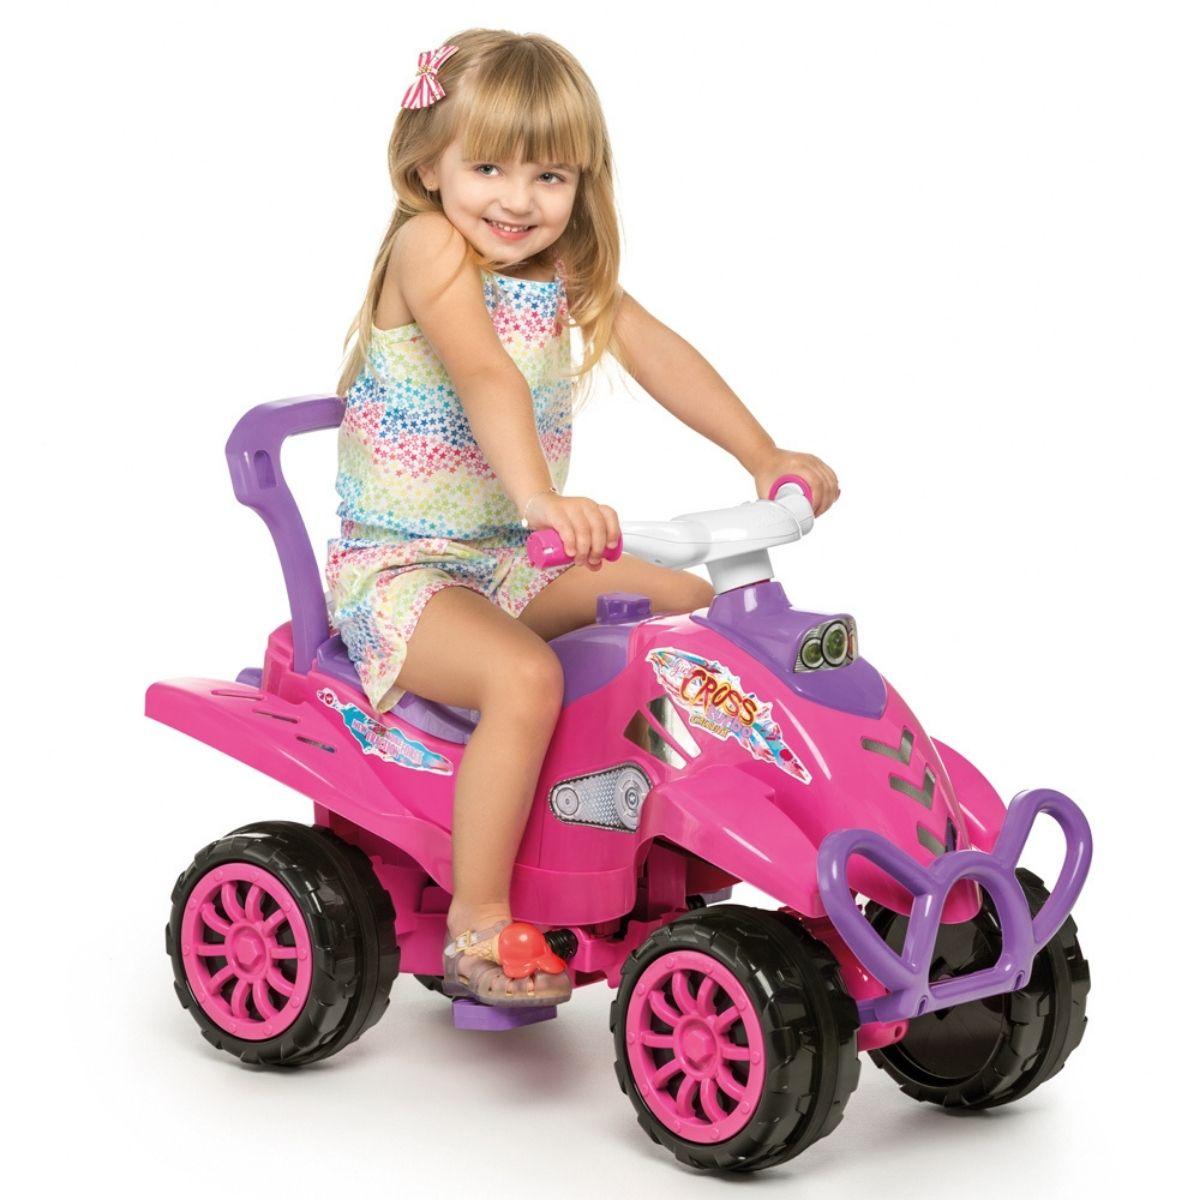 Quadriciclo Cross Turbo Rosa Pink Infantil